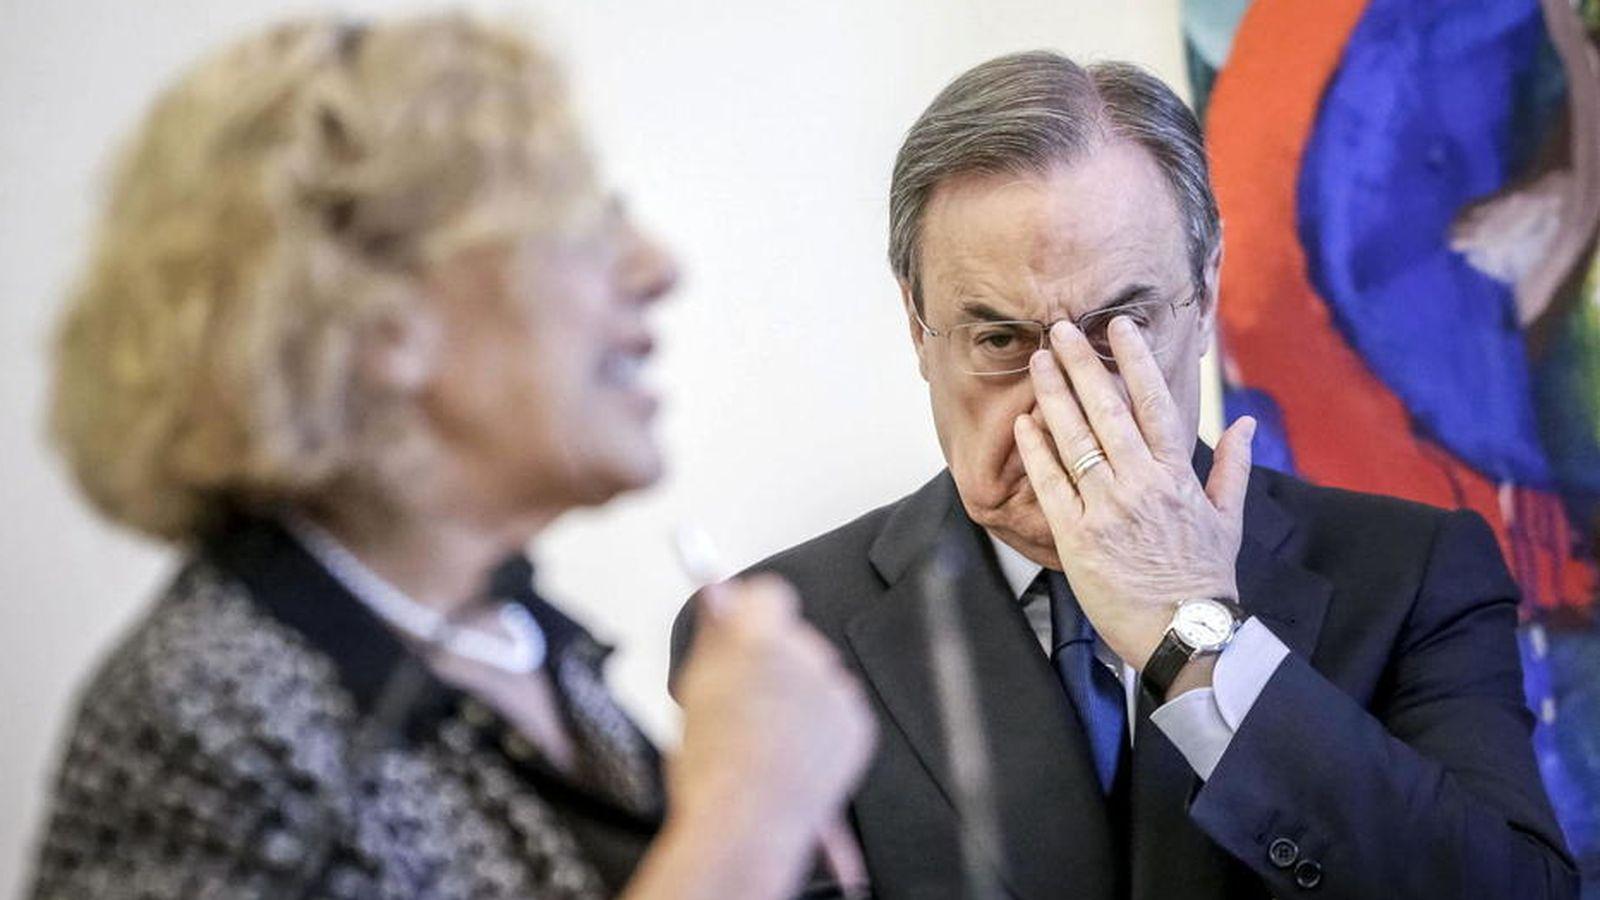 Foto: Manuela Carmena, junto al presidente del Real Madrid, Florentino Pérez. (EFE)